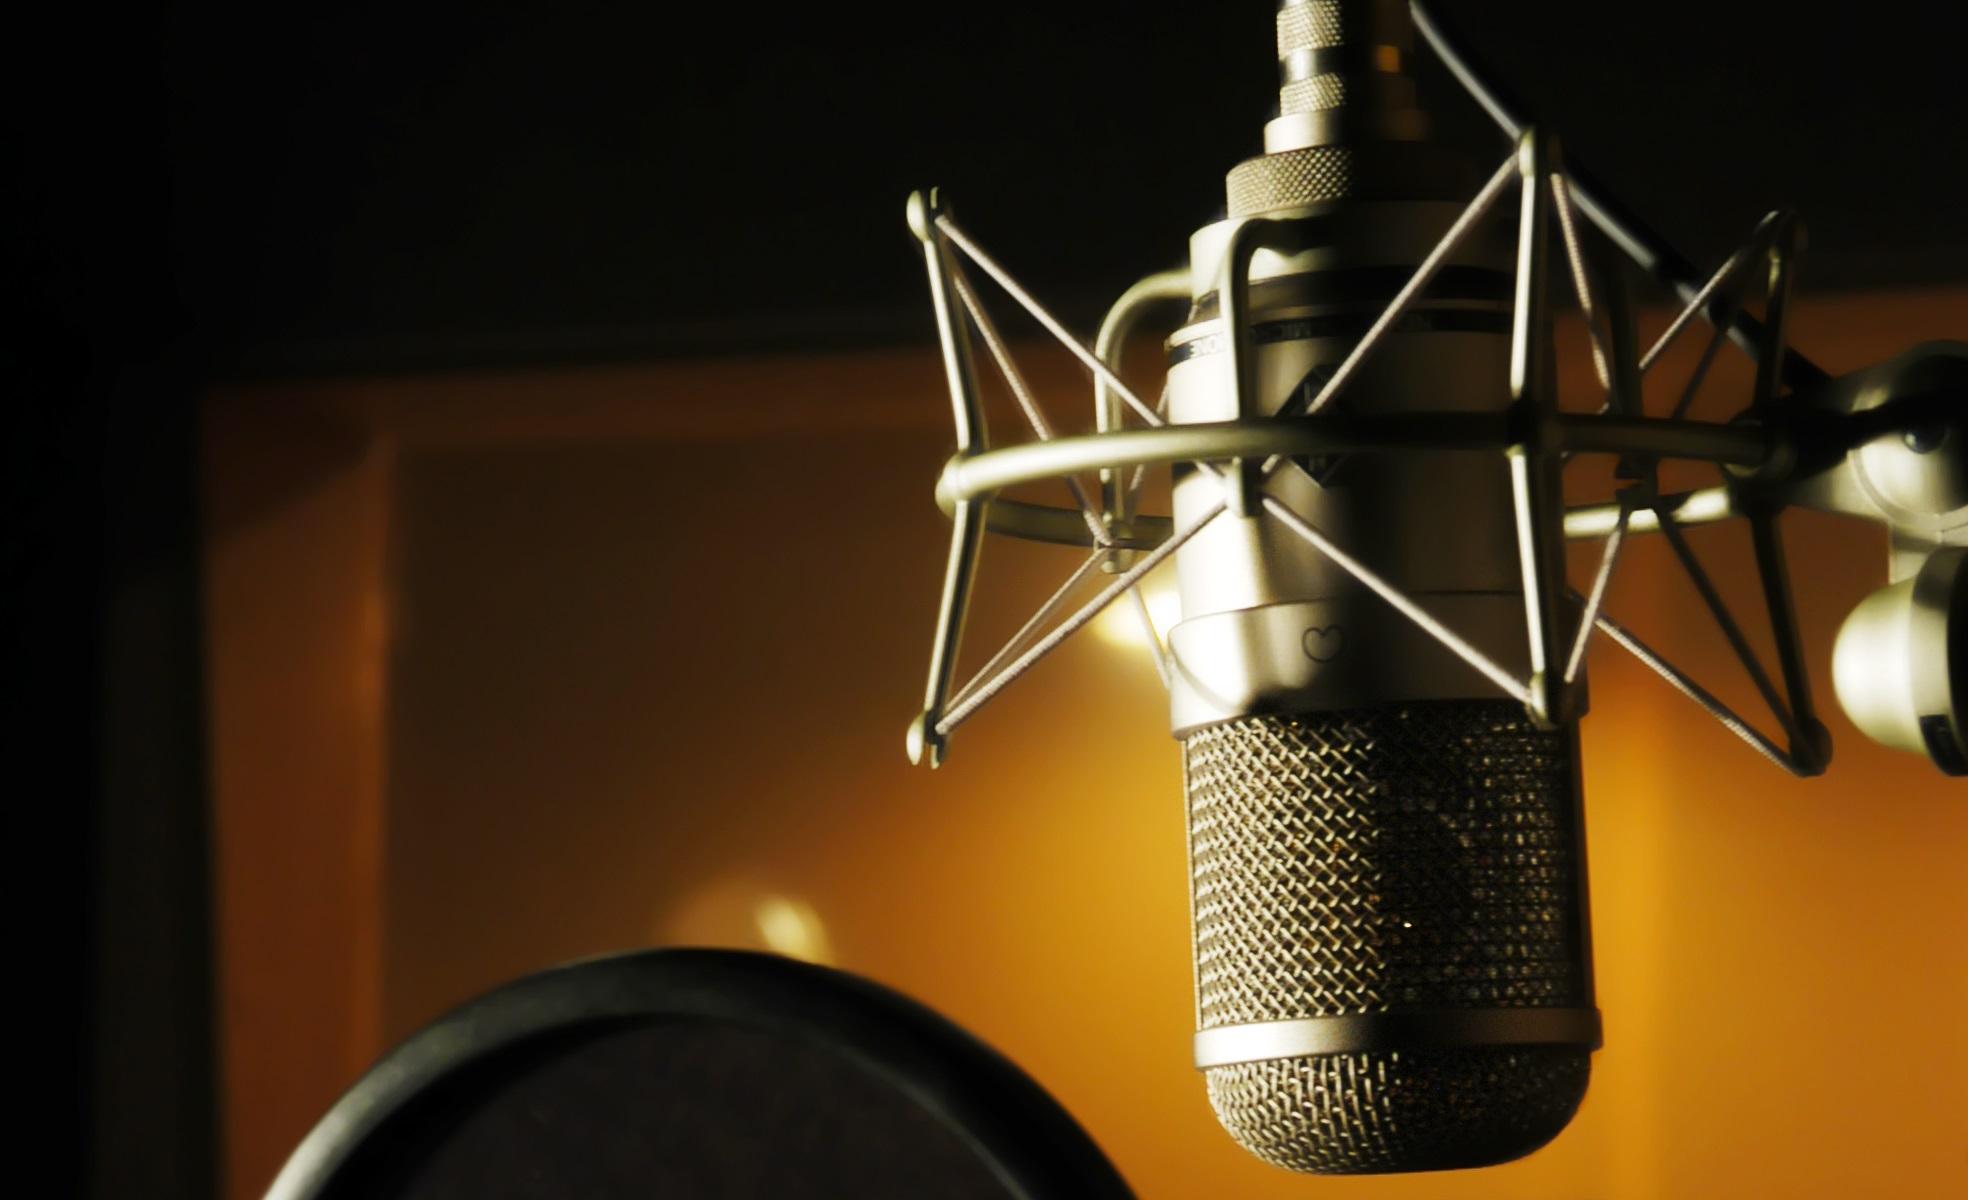 Podcast_Popularity_Marketing_Innovation_Keynote_Speaker_Igor_Beuker_podcasting_podcasts_